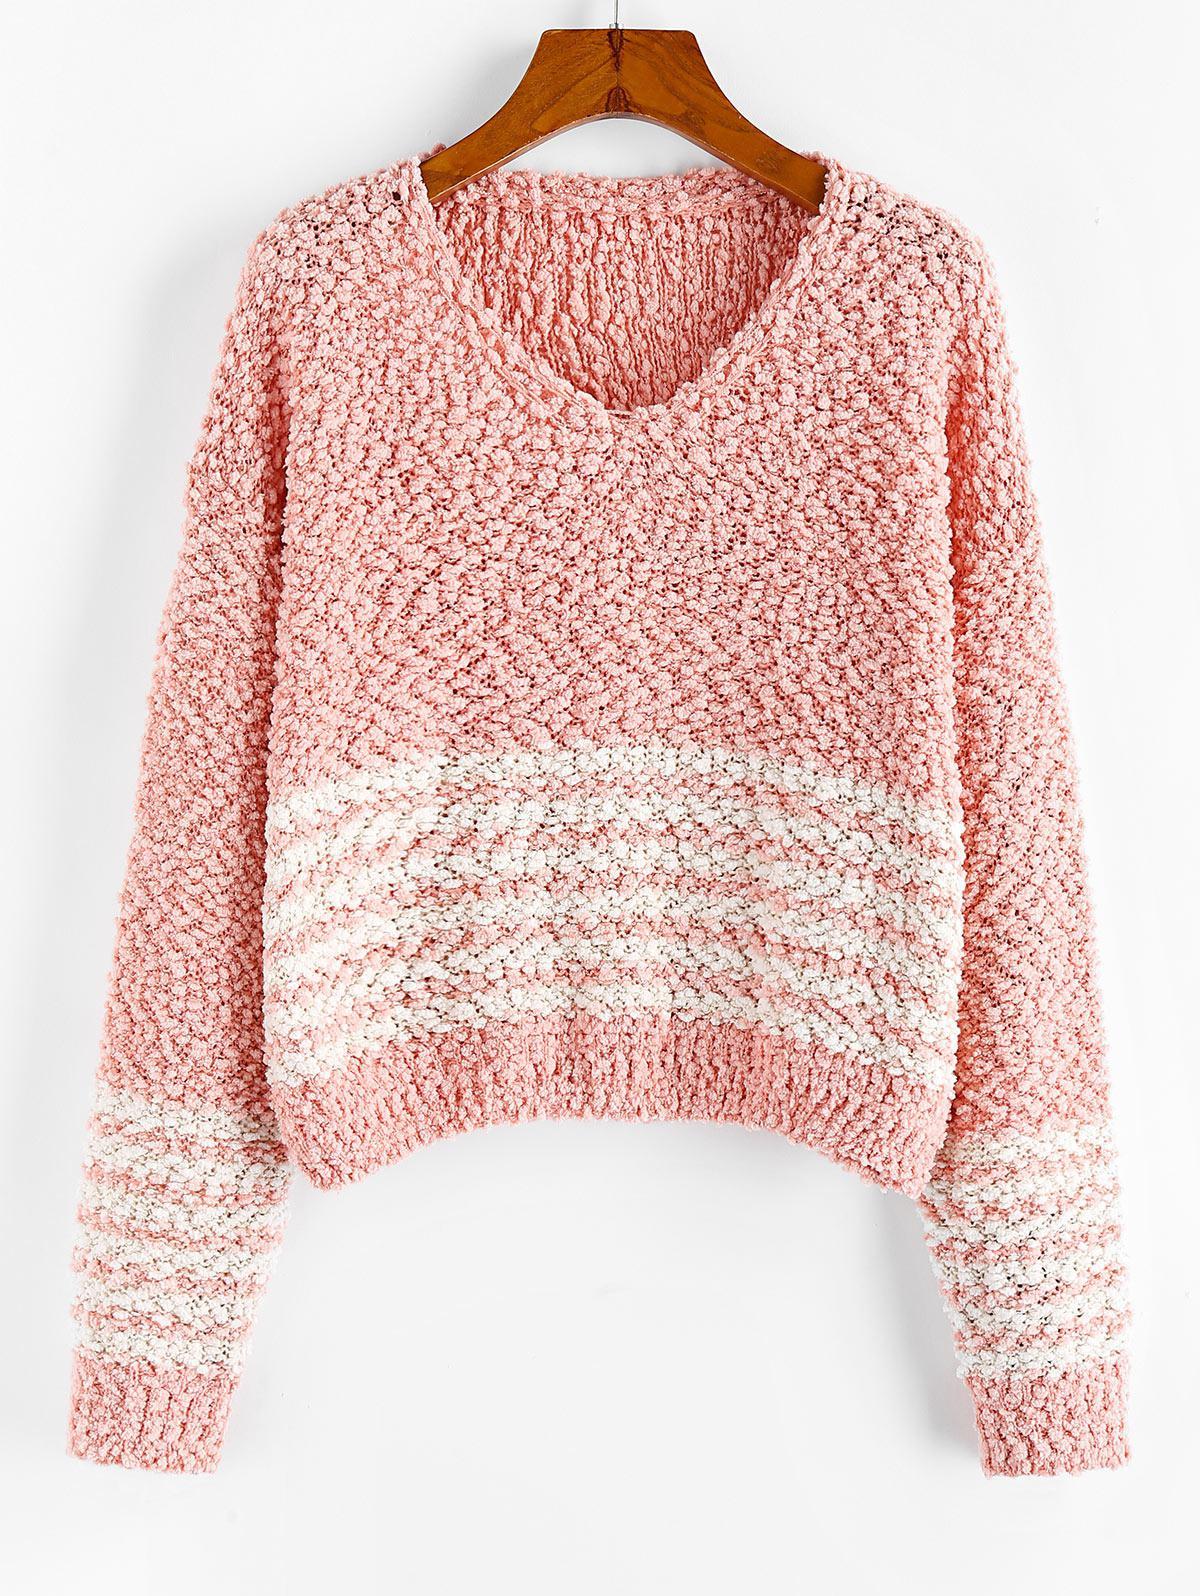 ZAFUL Popcorn Knit Striped Drop Shoulder Sweater